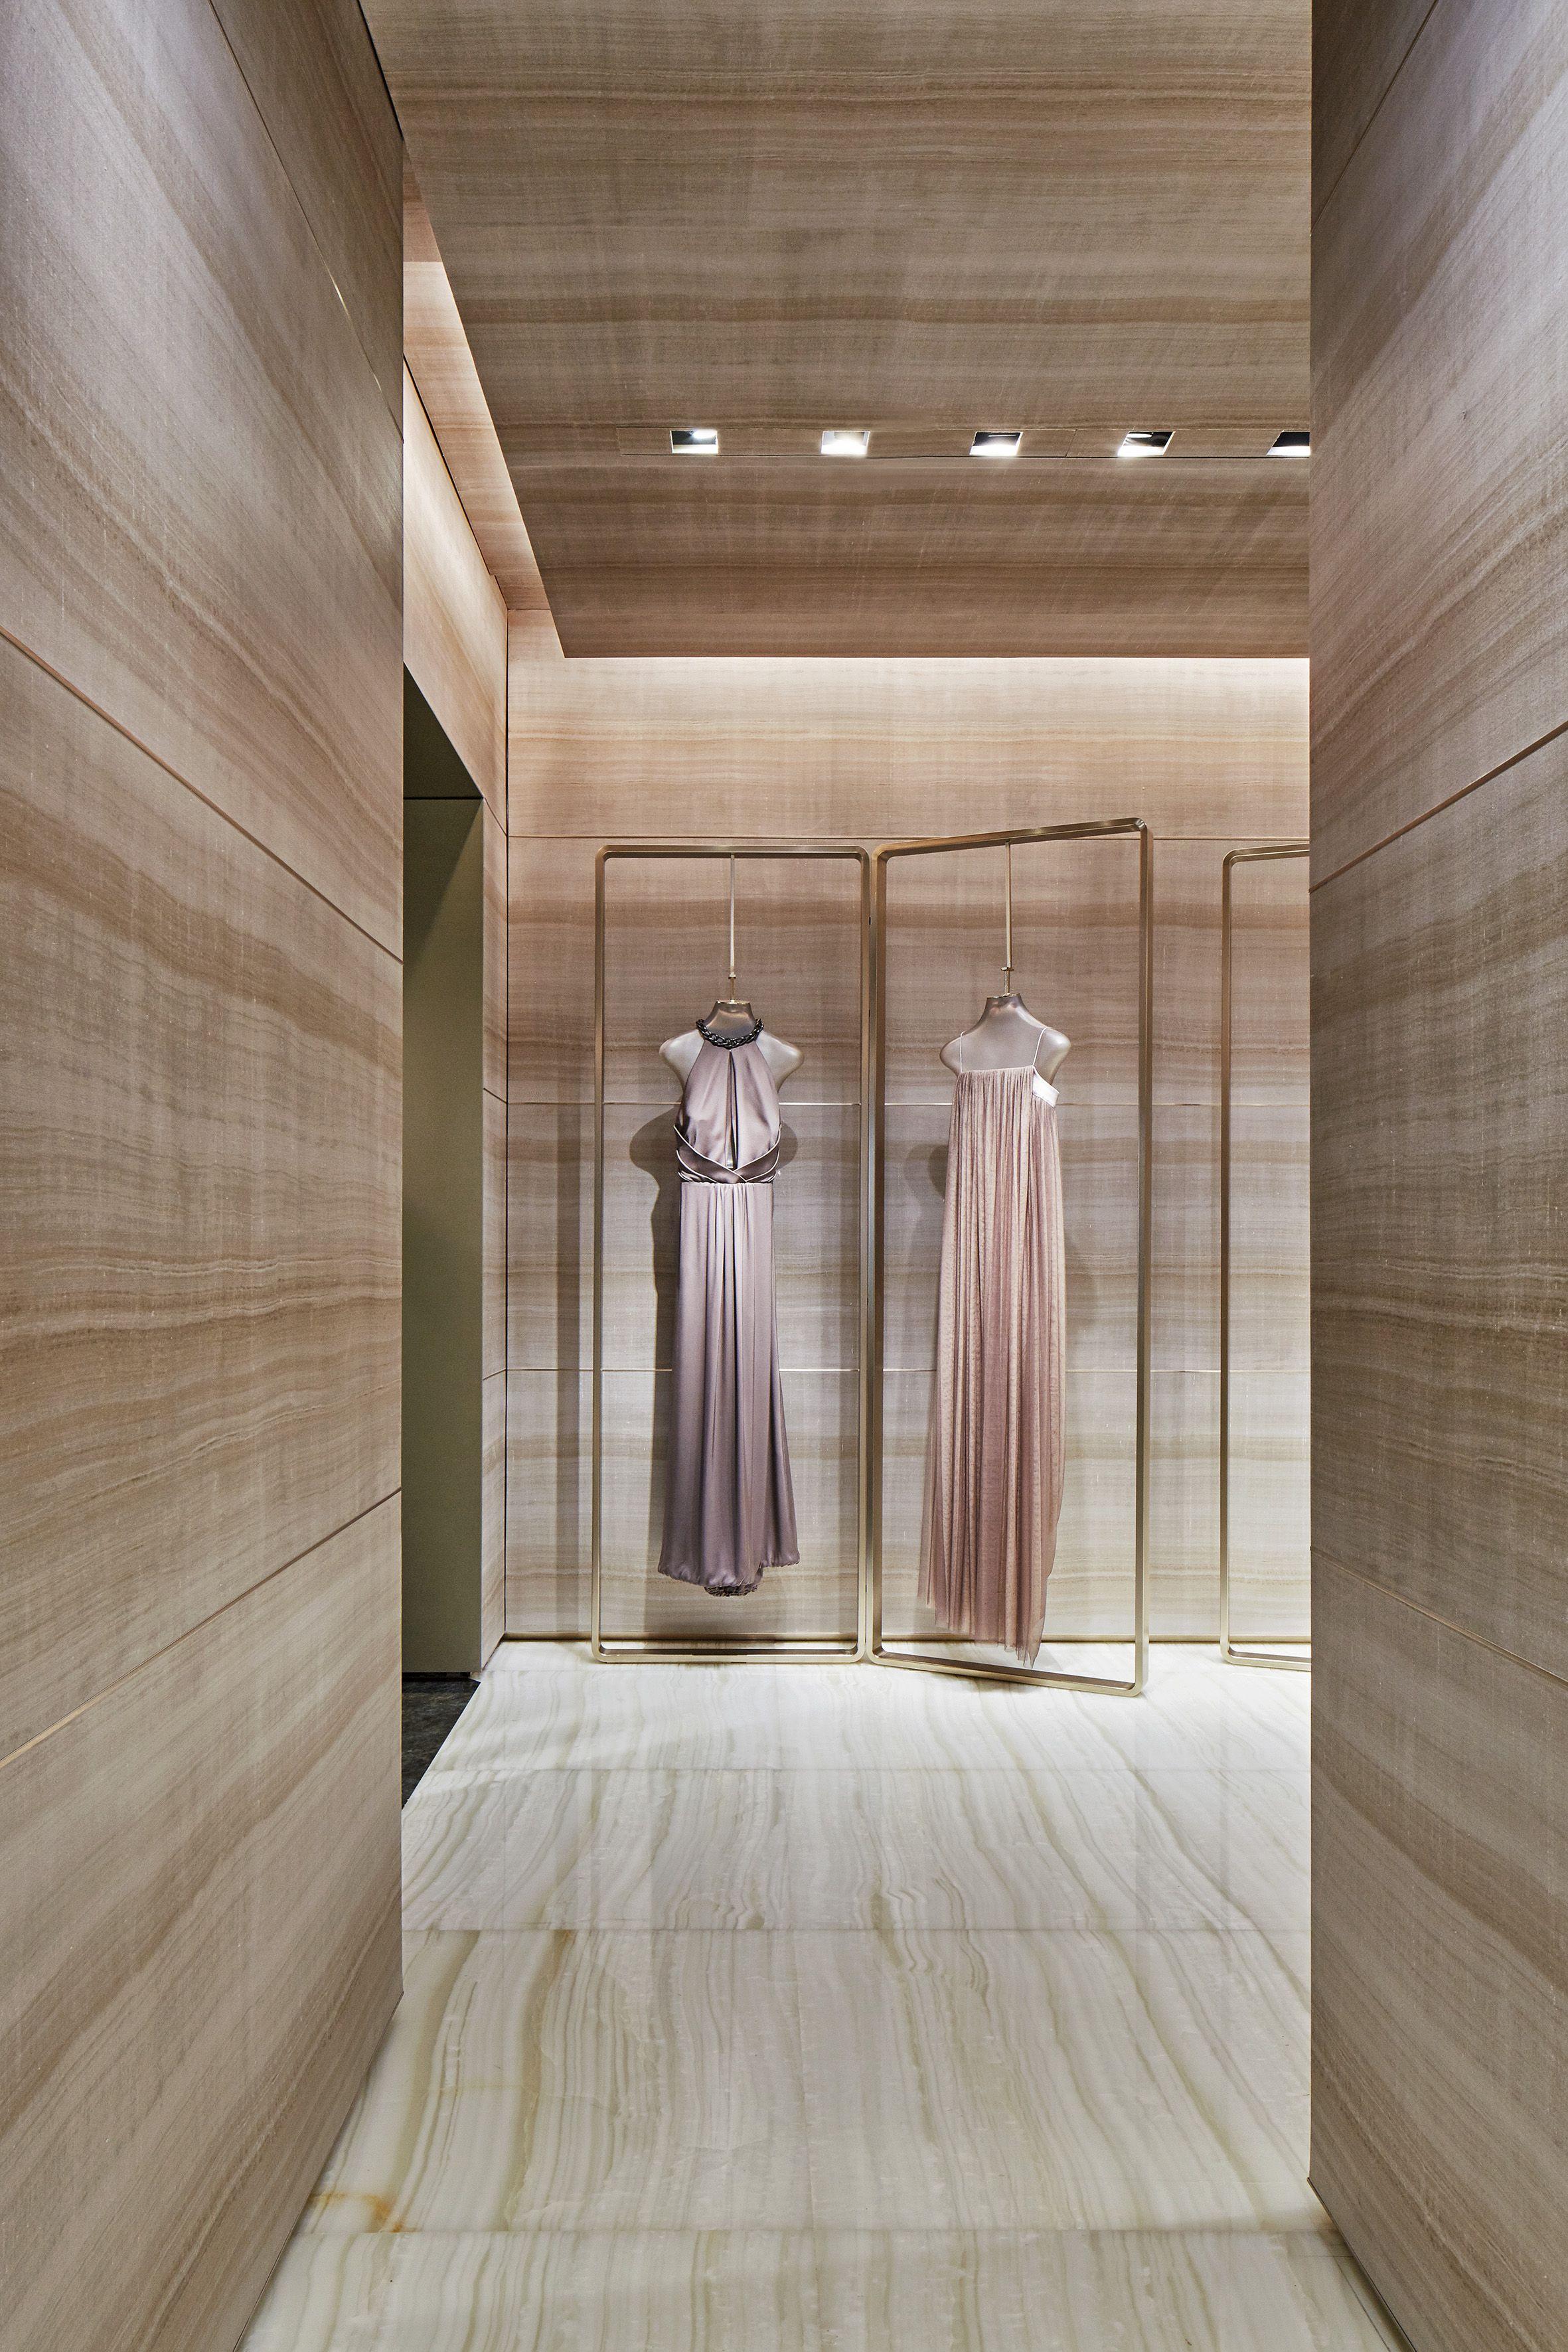 Giorgio armani boutique via montenapoleone milano af for Milano design shop